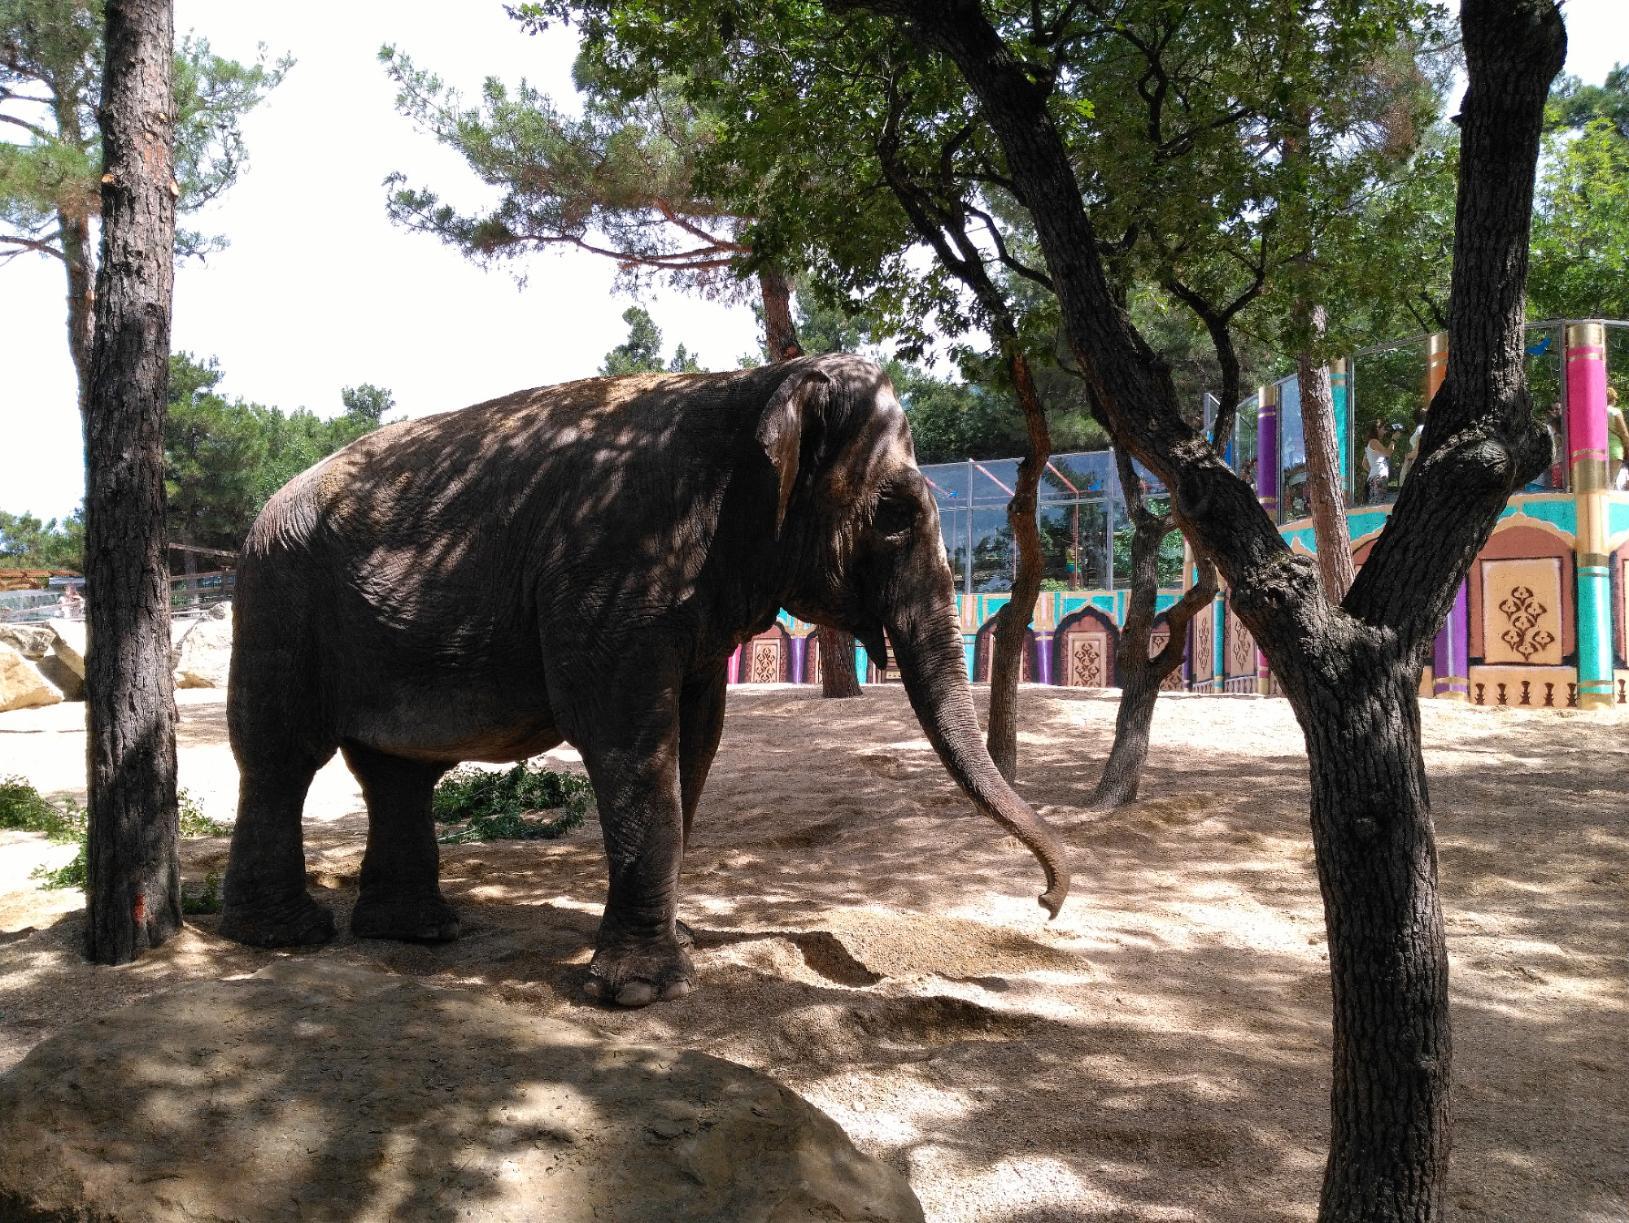 Female ♀ Asian elephant (Elephas maximus) Tschani (Chani) at Gelendzhik Safaripark